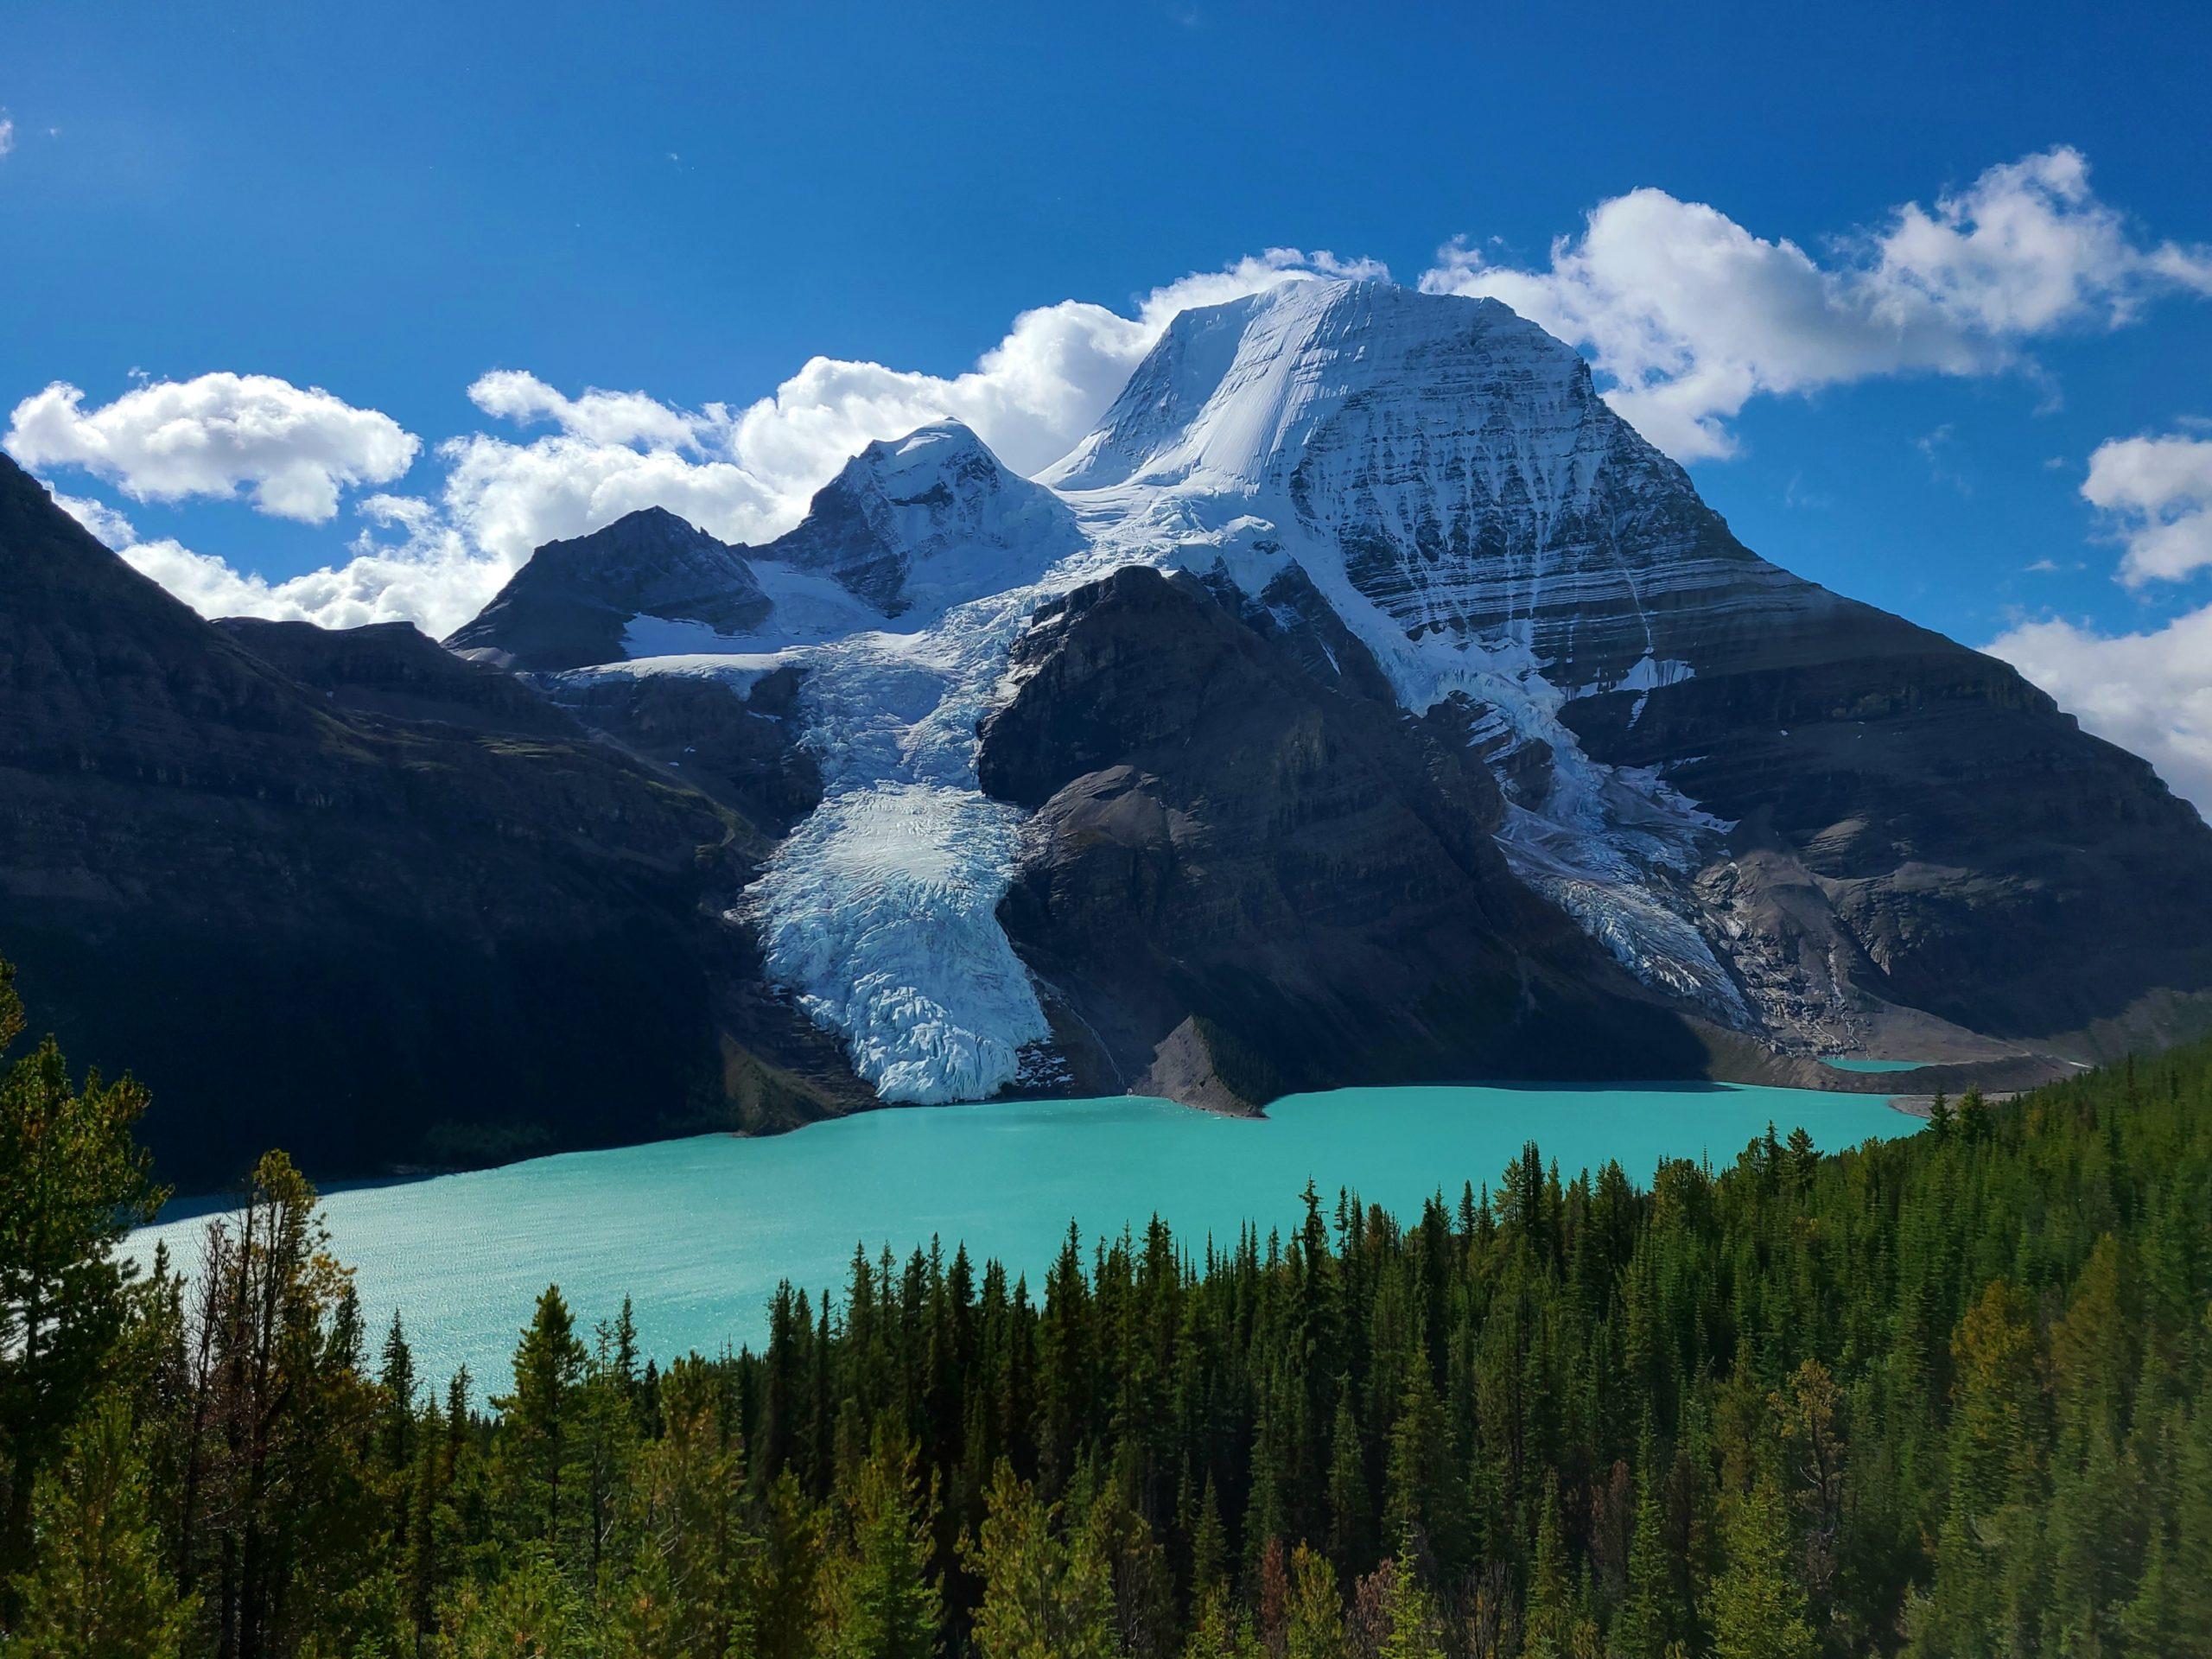 alt=Berg Lake and Mount Robson